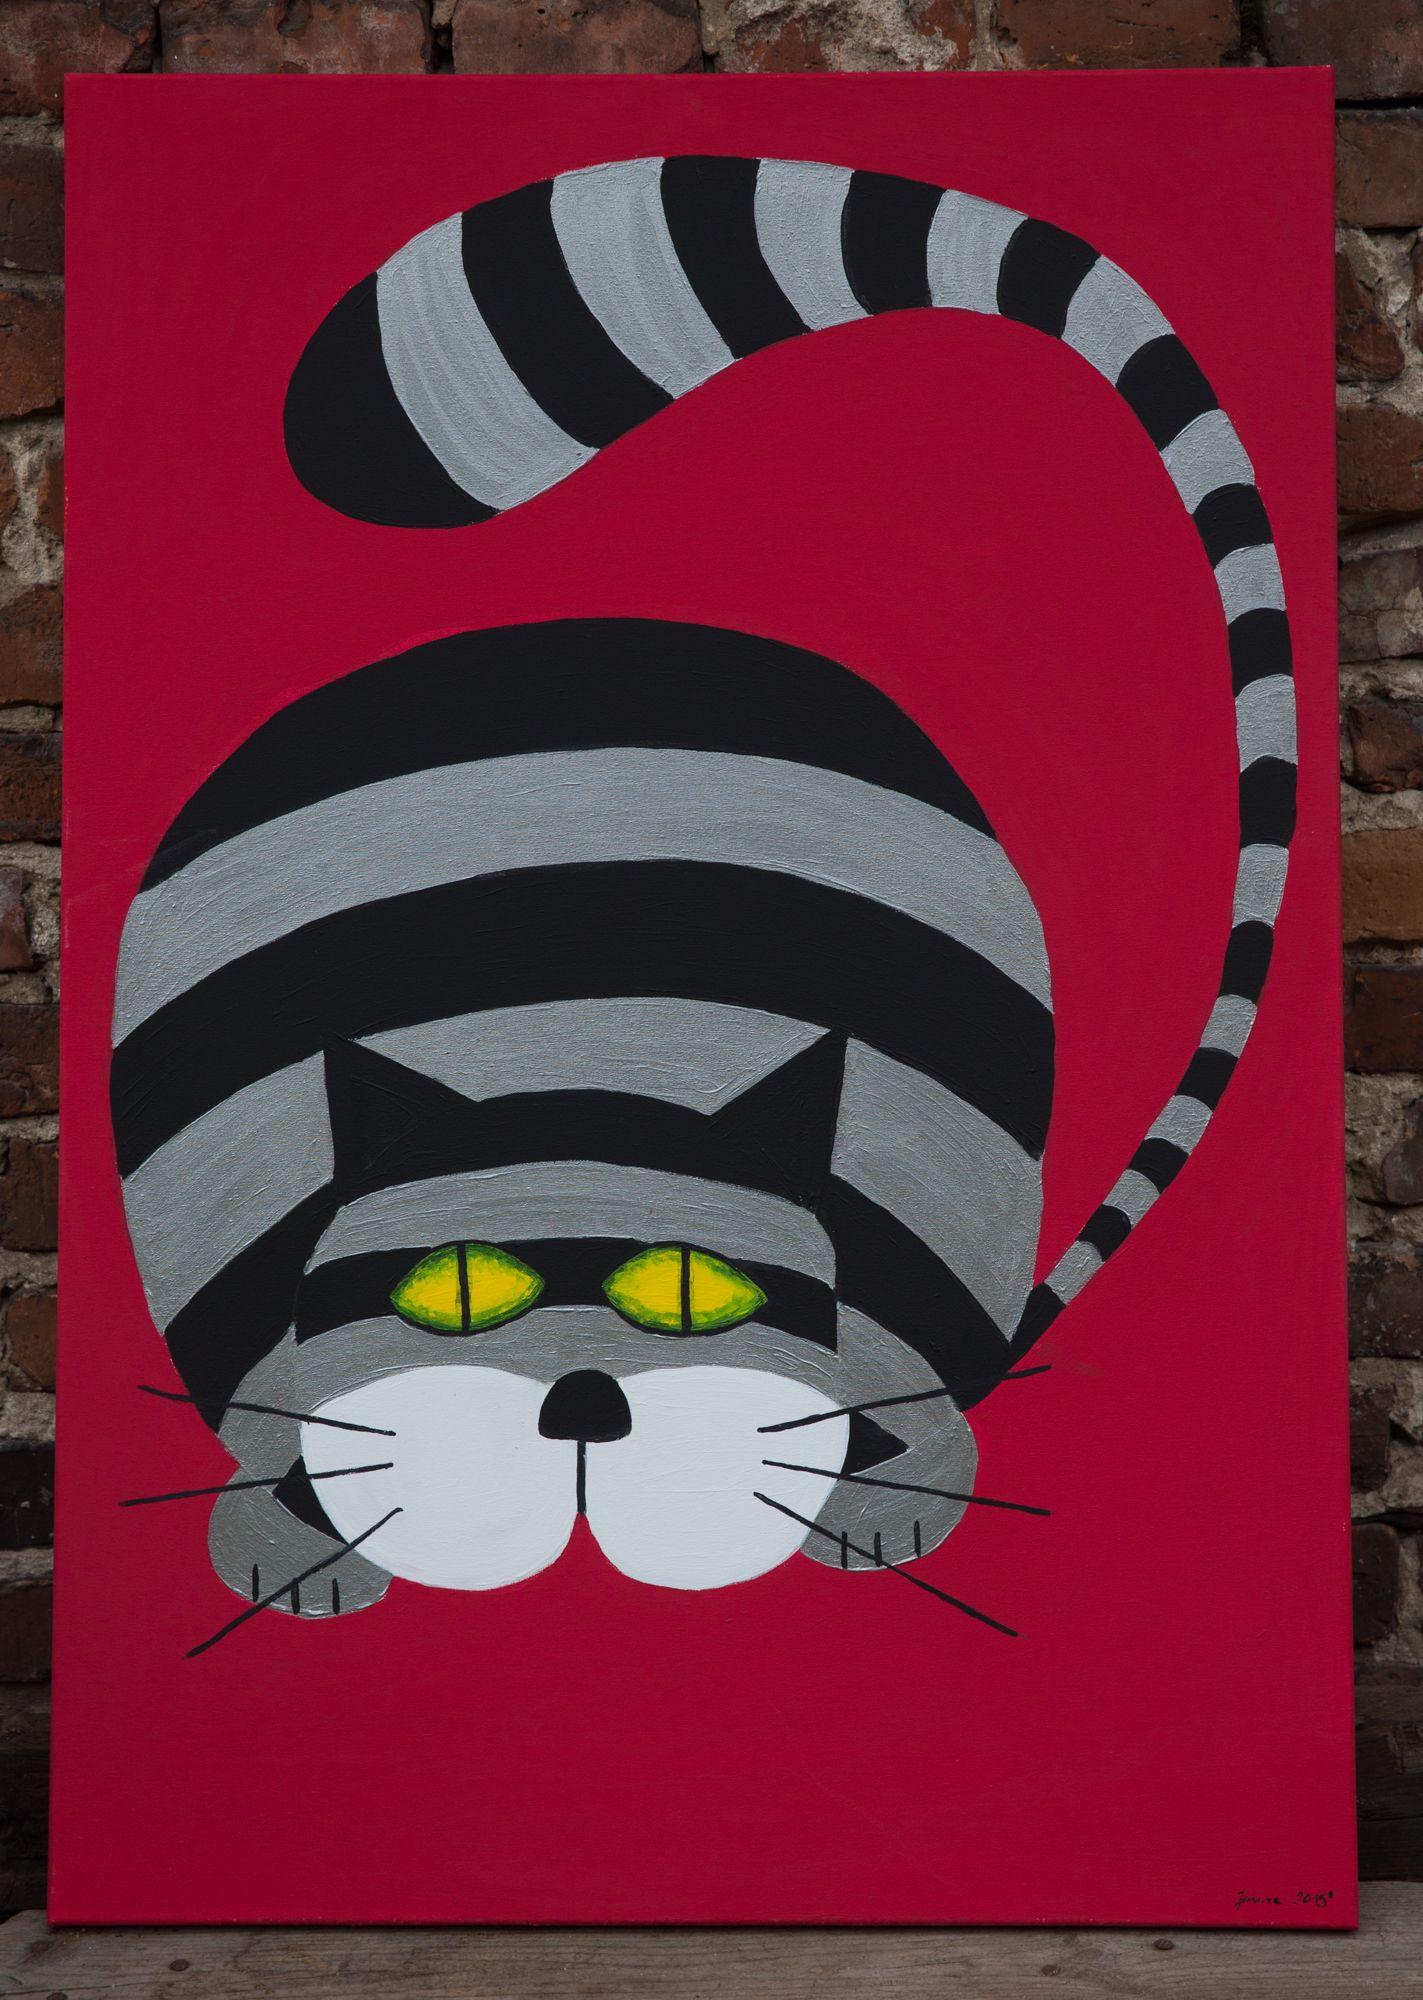 Obraz Malowany Farbami Akrylowymi Na Płótnie Koci Kot Pinterest